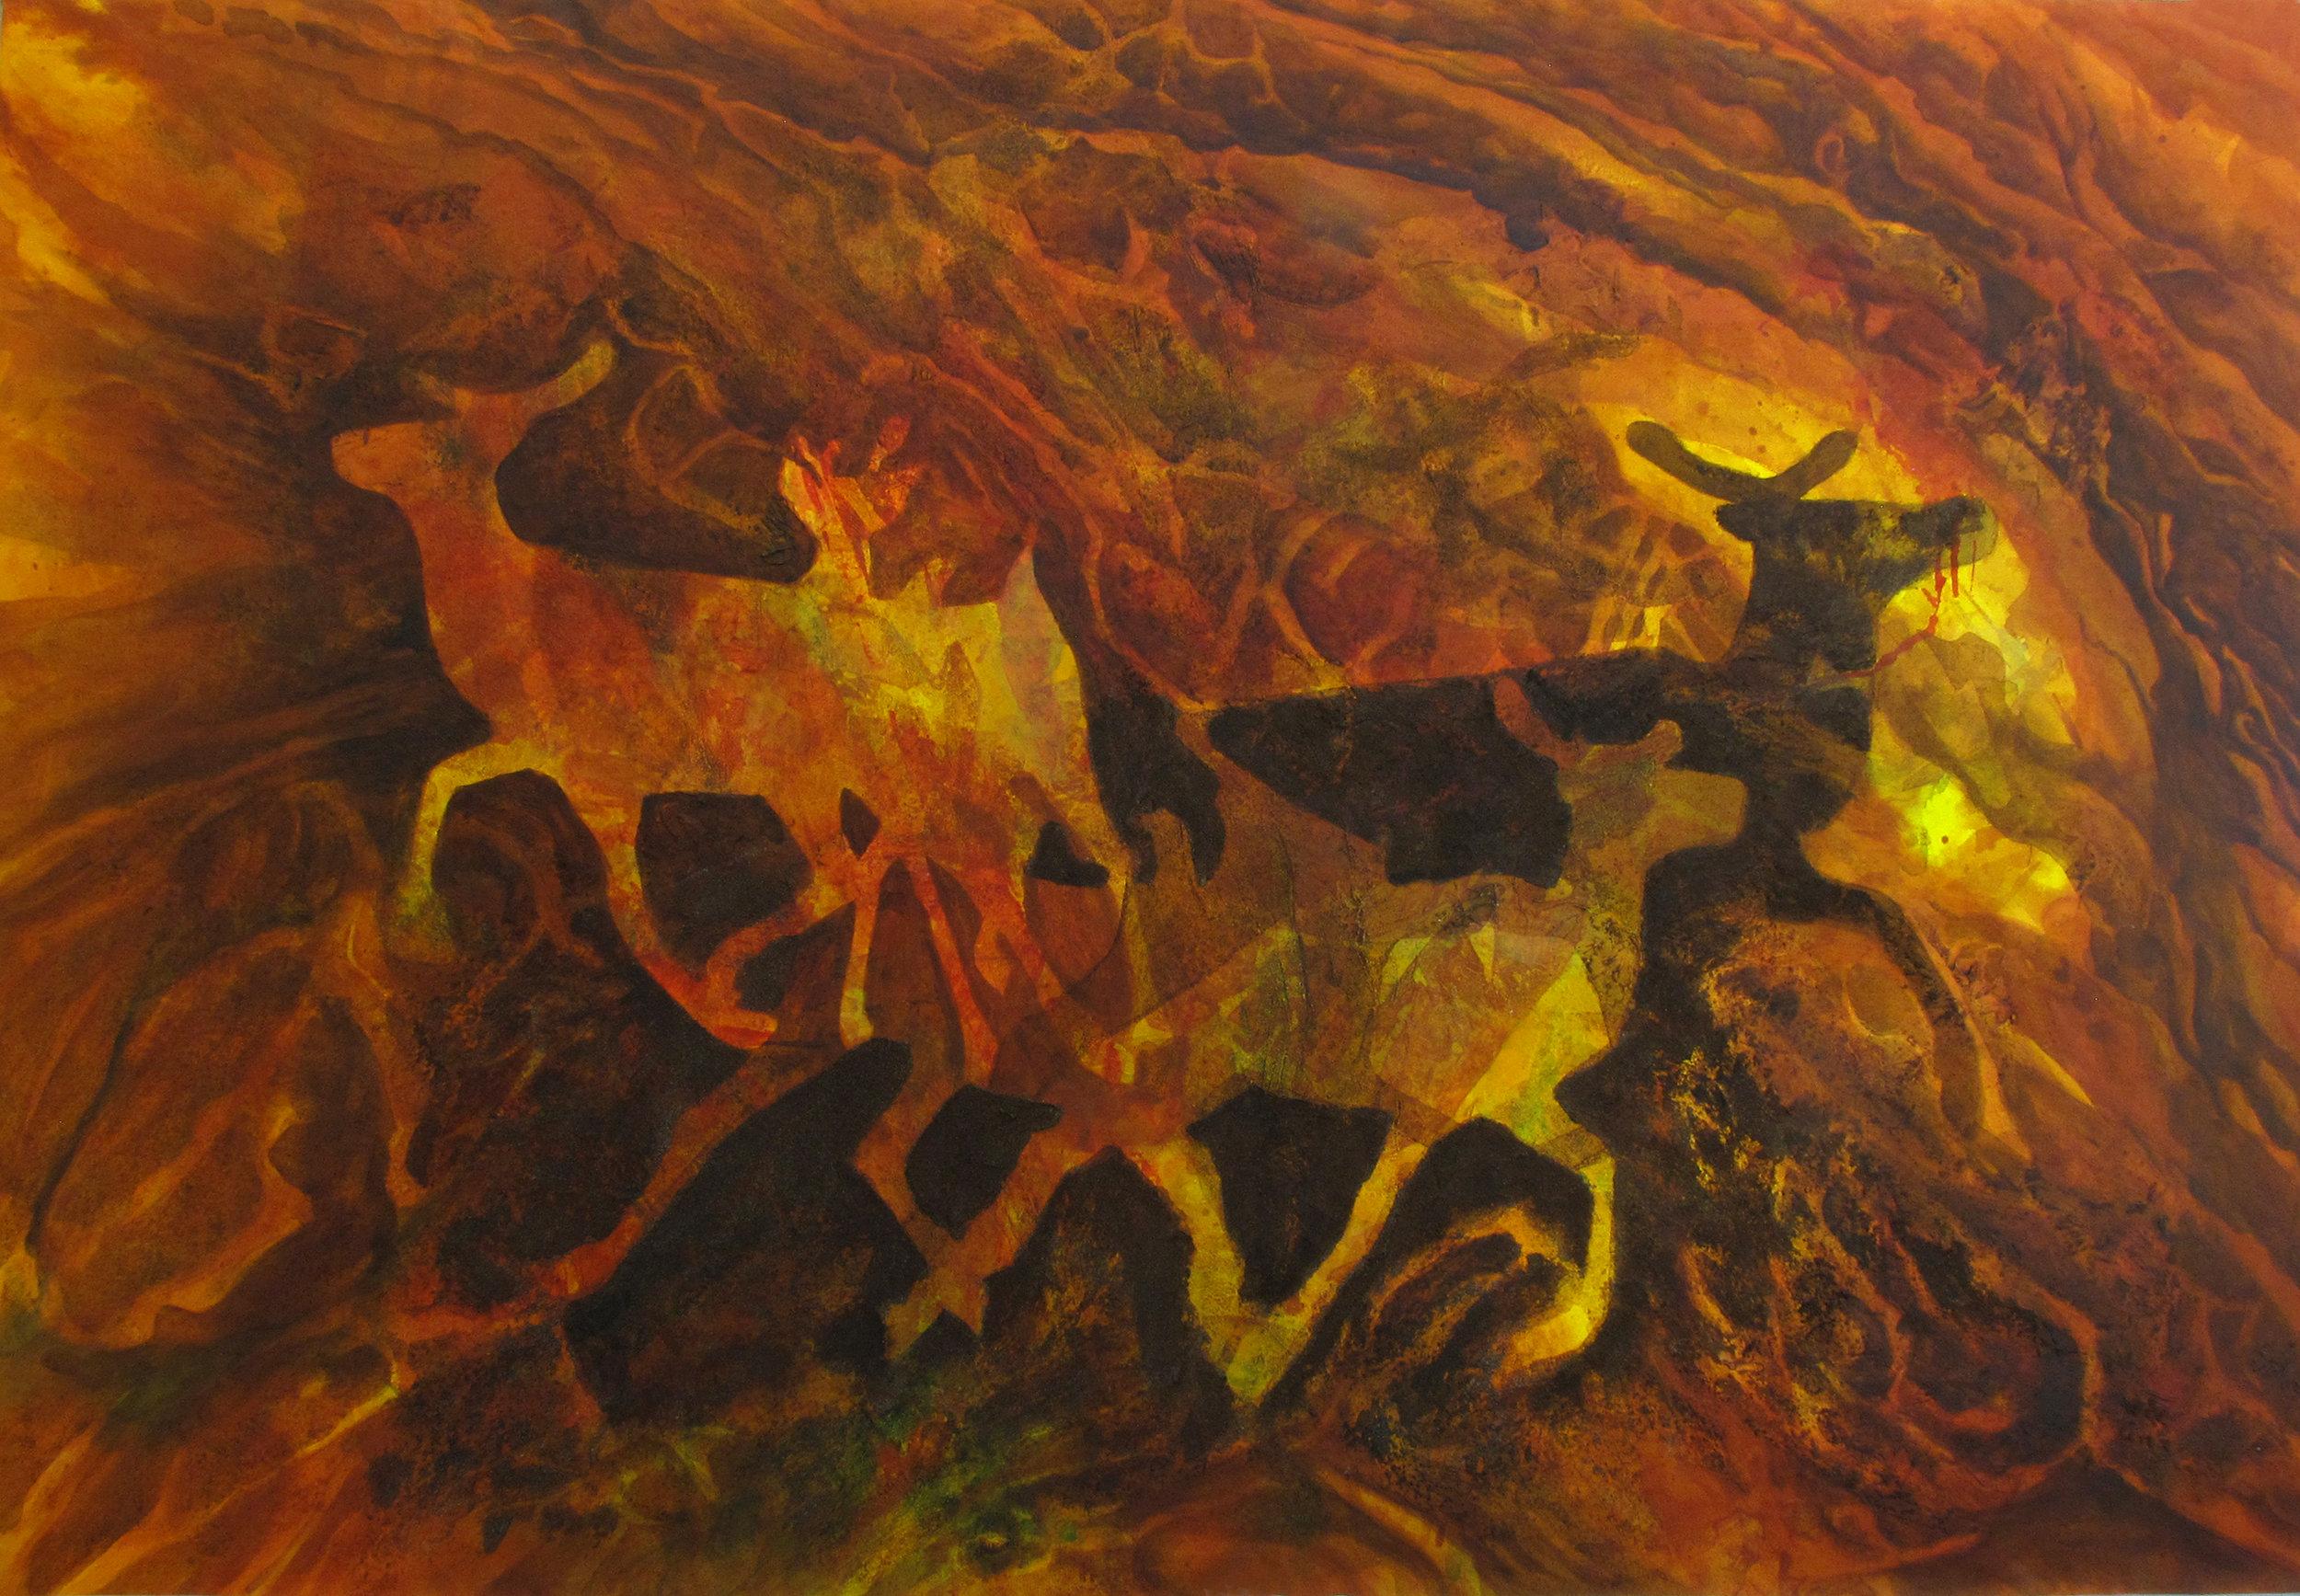 Joyce Majiski, Spiral Dance , 2012. Acrylic and mixed media on canvas. 48.5 x 72 in.